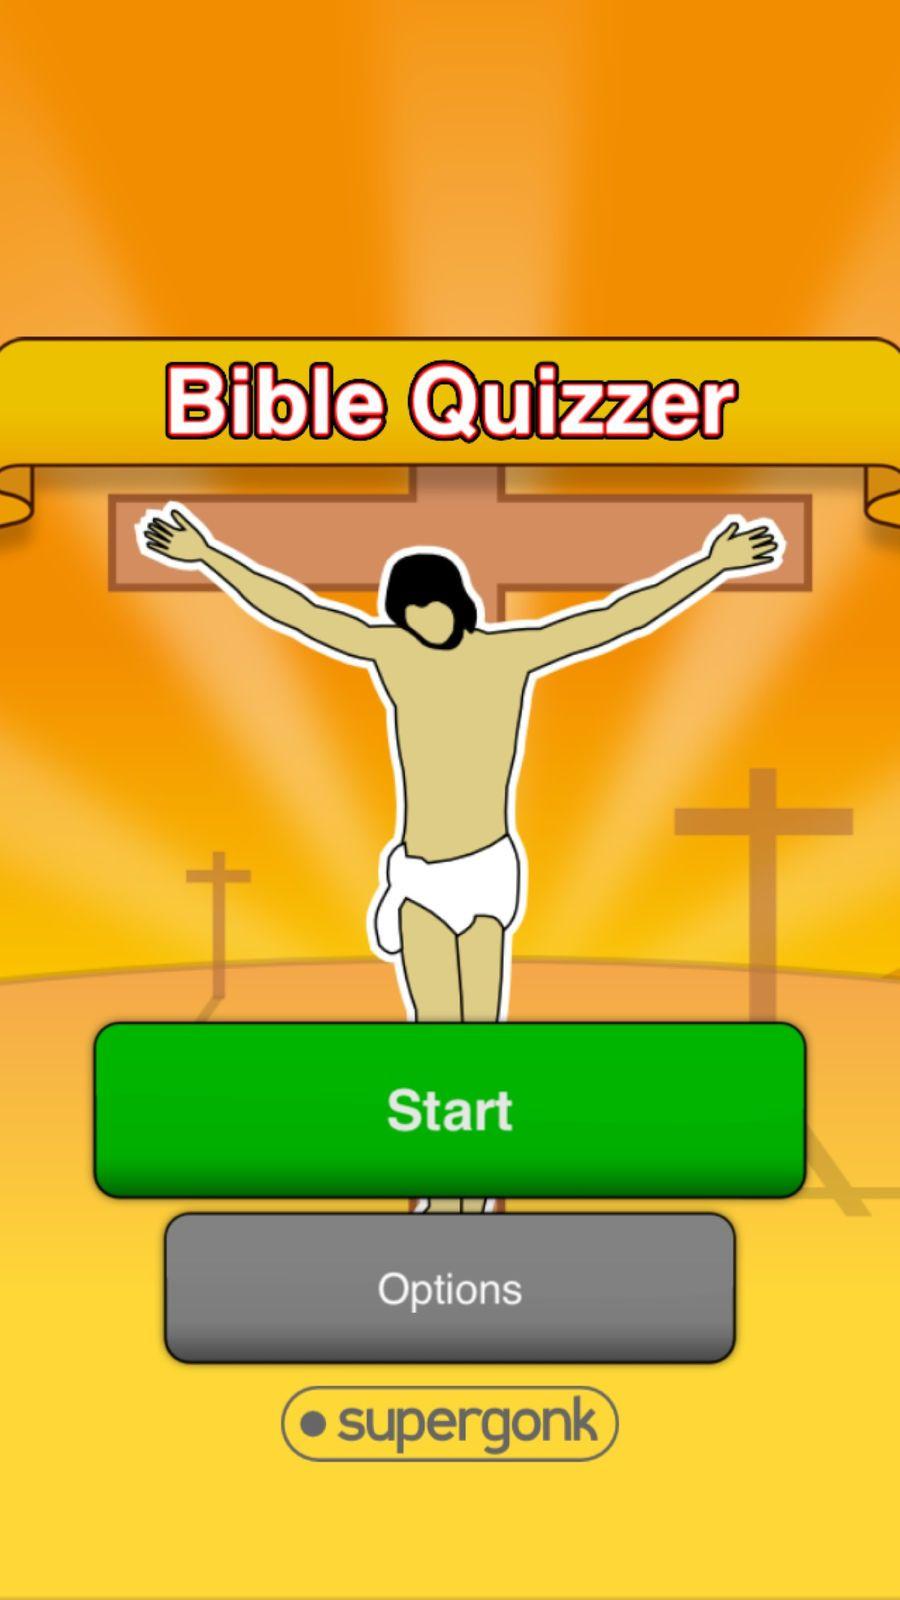 Bible Quizzer TriviaEducationappsios Trivia app, How